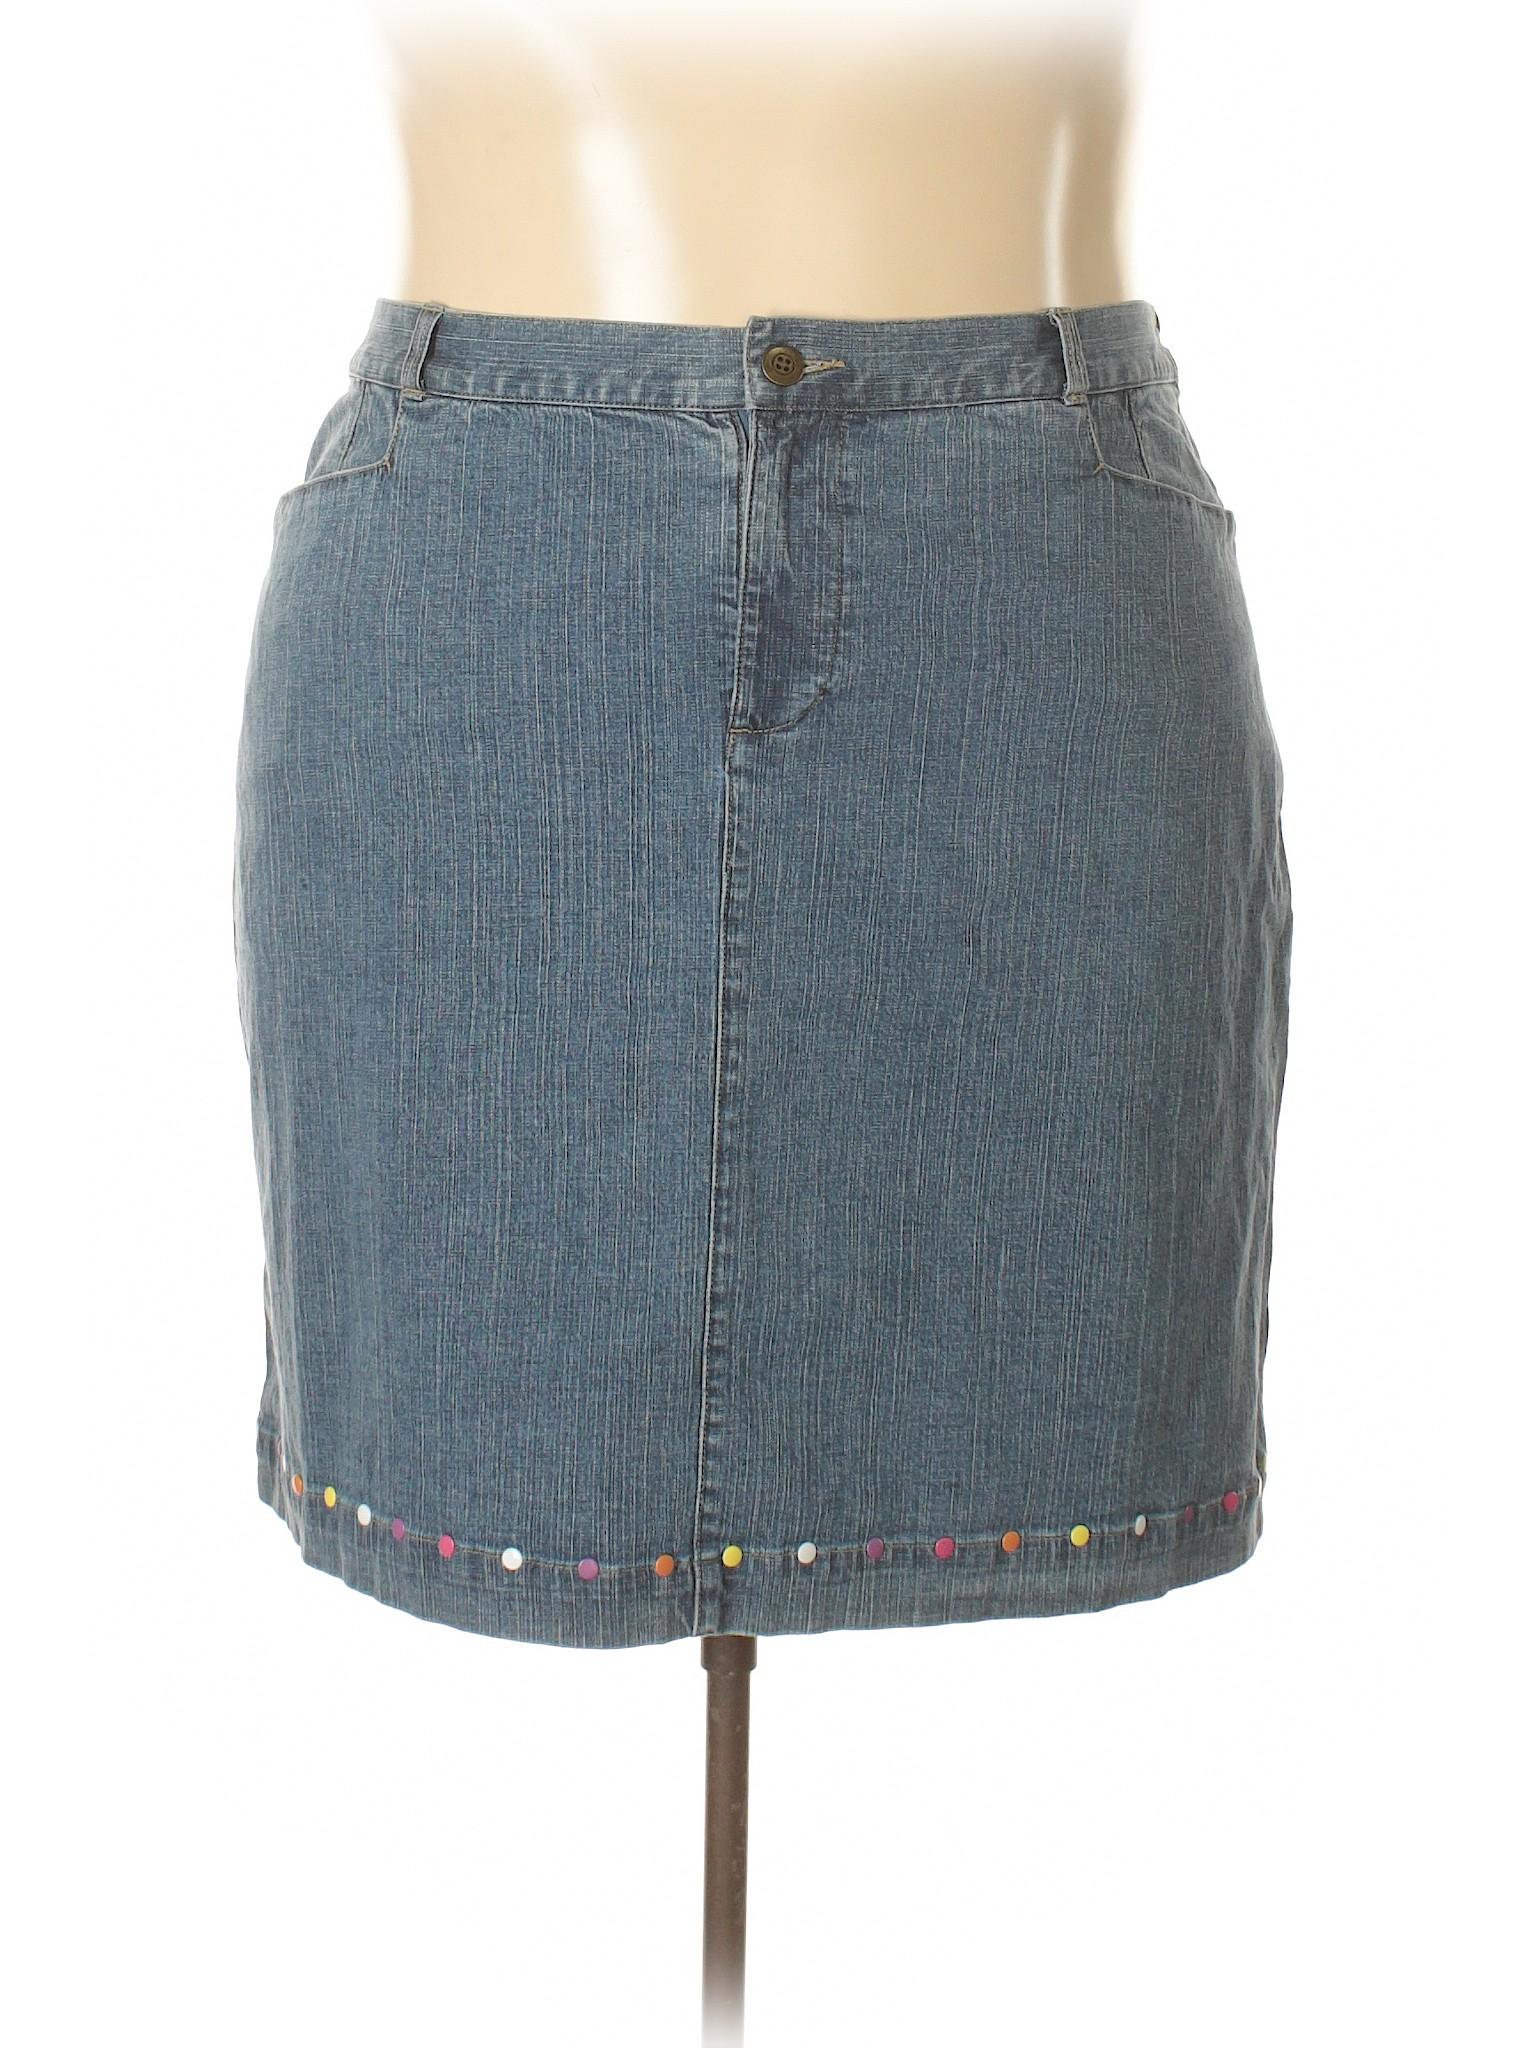 Denim Cj Boutique leisure Skirt Banks n1xfaxz